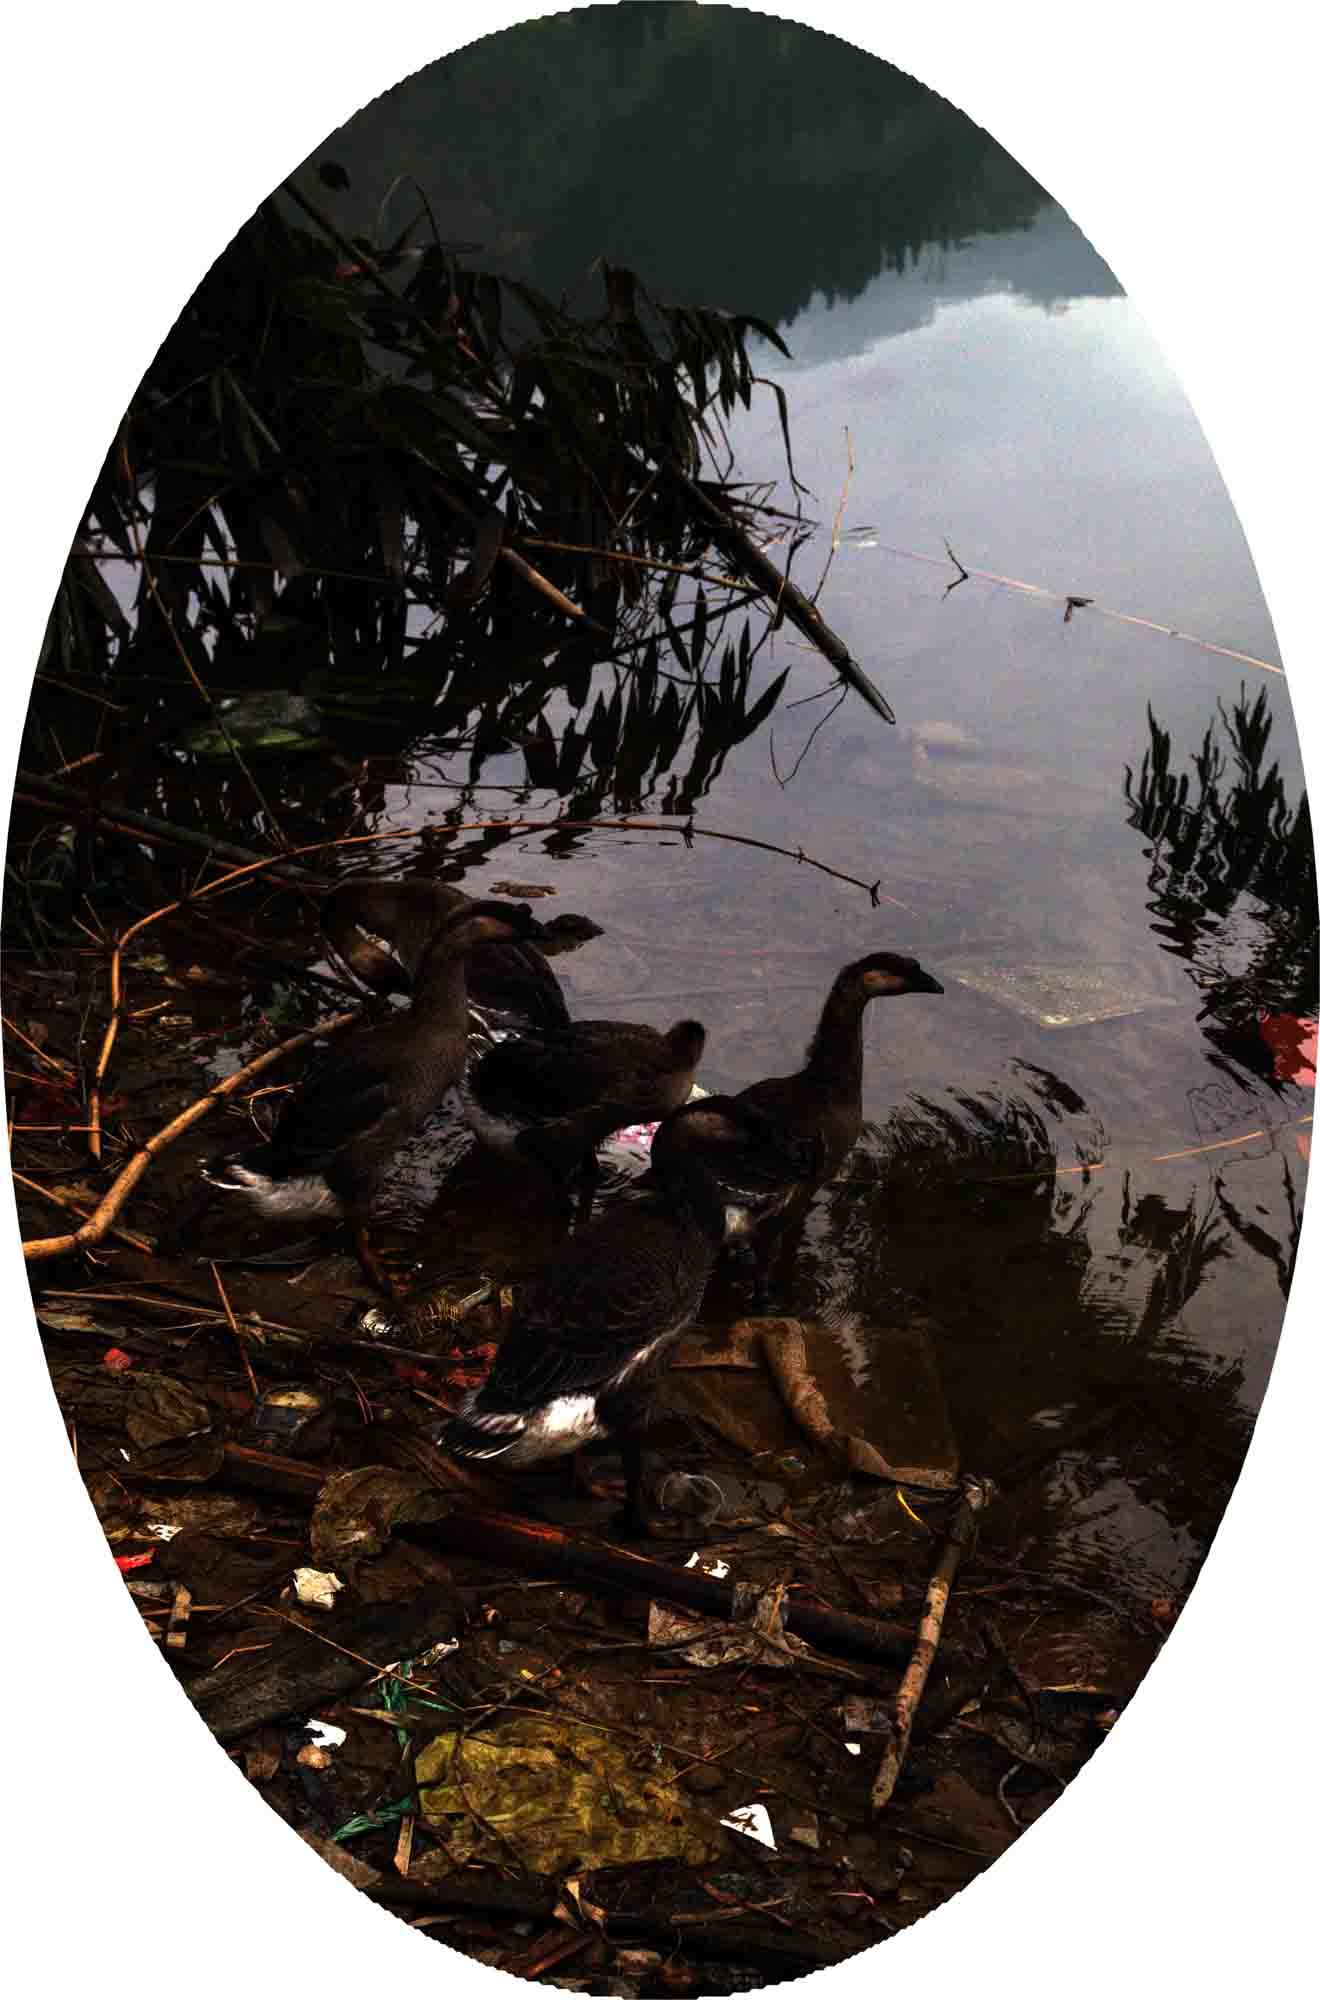 GUO JIAN   Picturesque Scenery  2012 Digital pigment print on archival cotton rag paper 90 x 60 cm